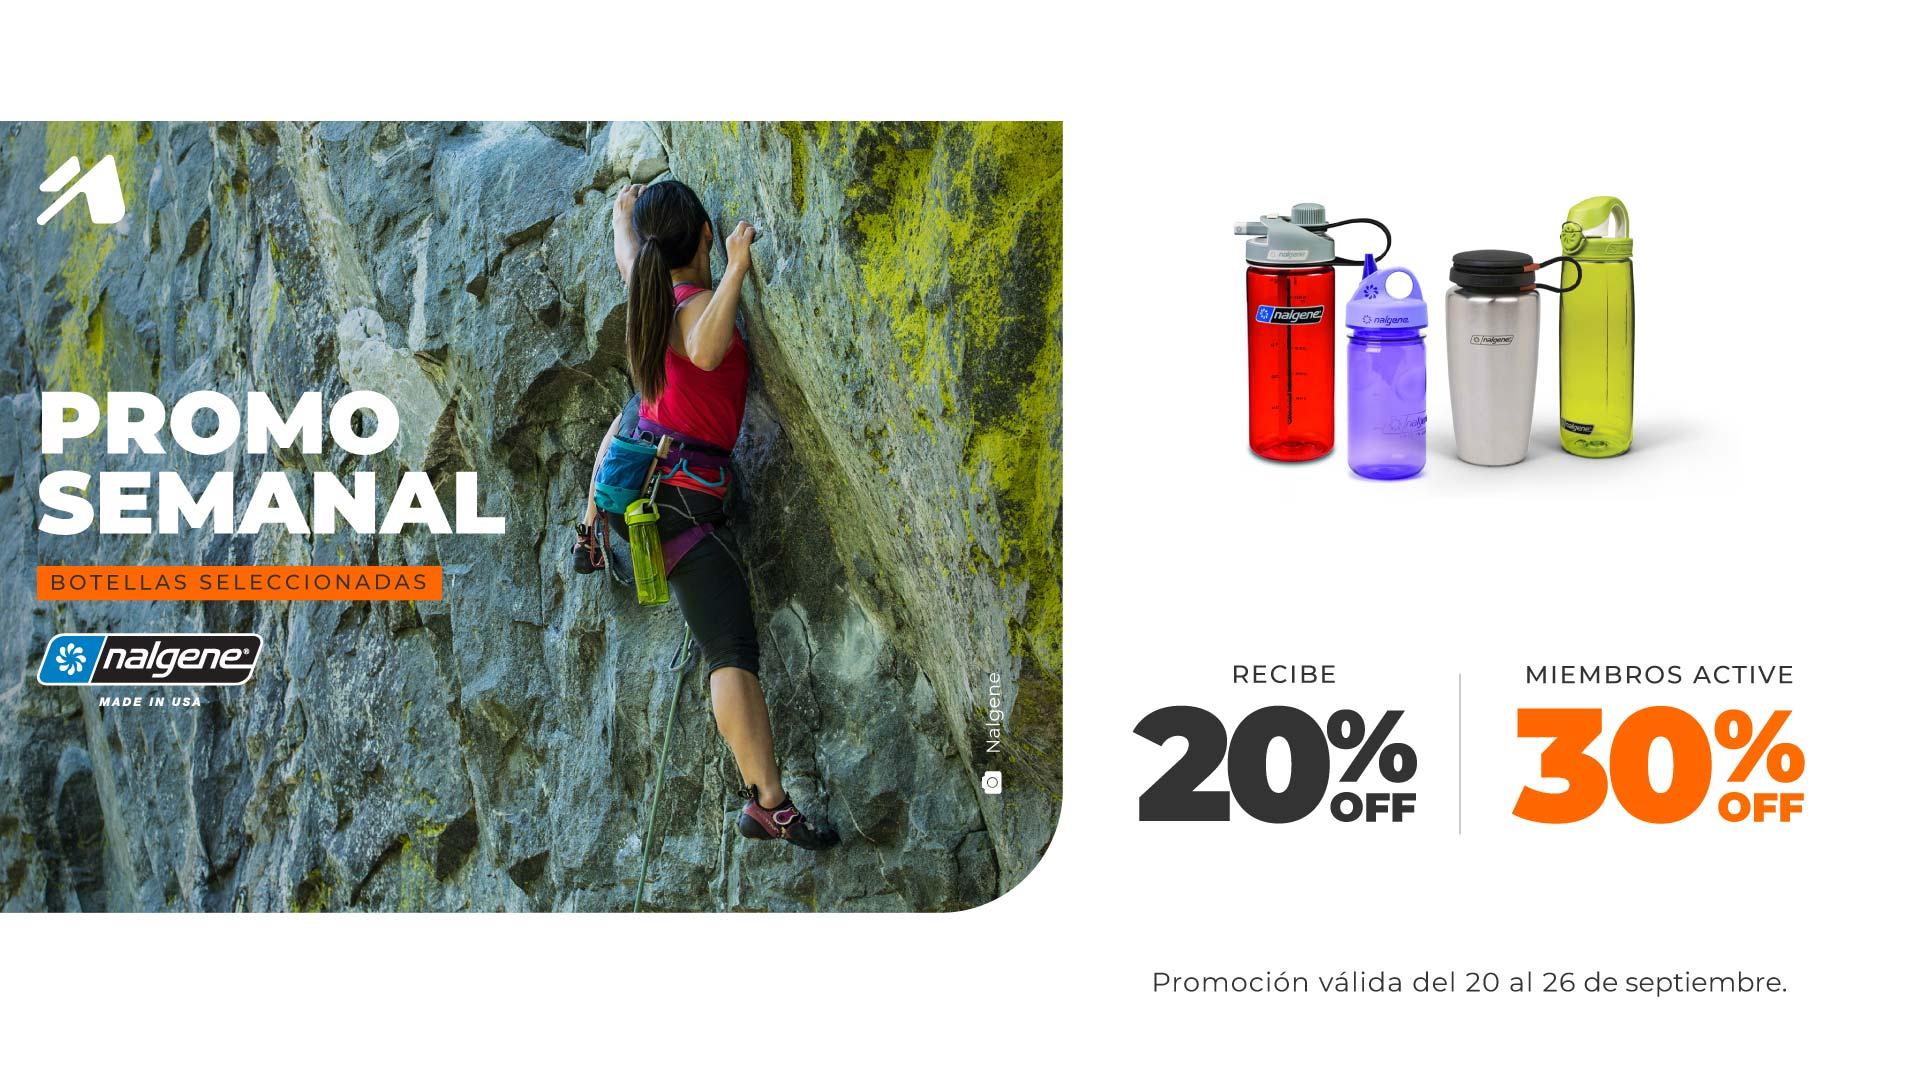 Promo semanal Chile: Botellas seleccionadas de Nalgene.